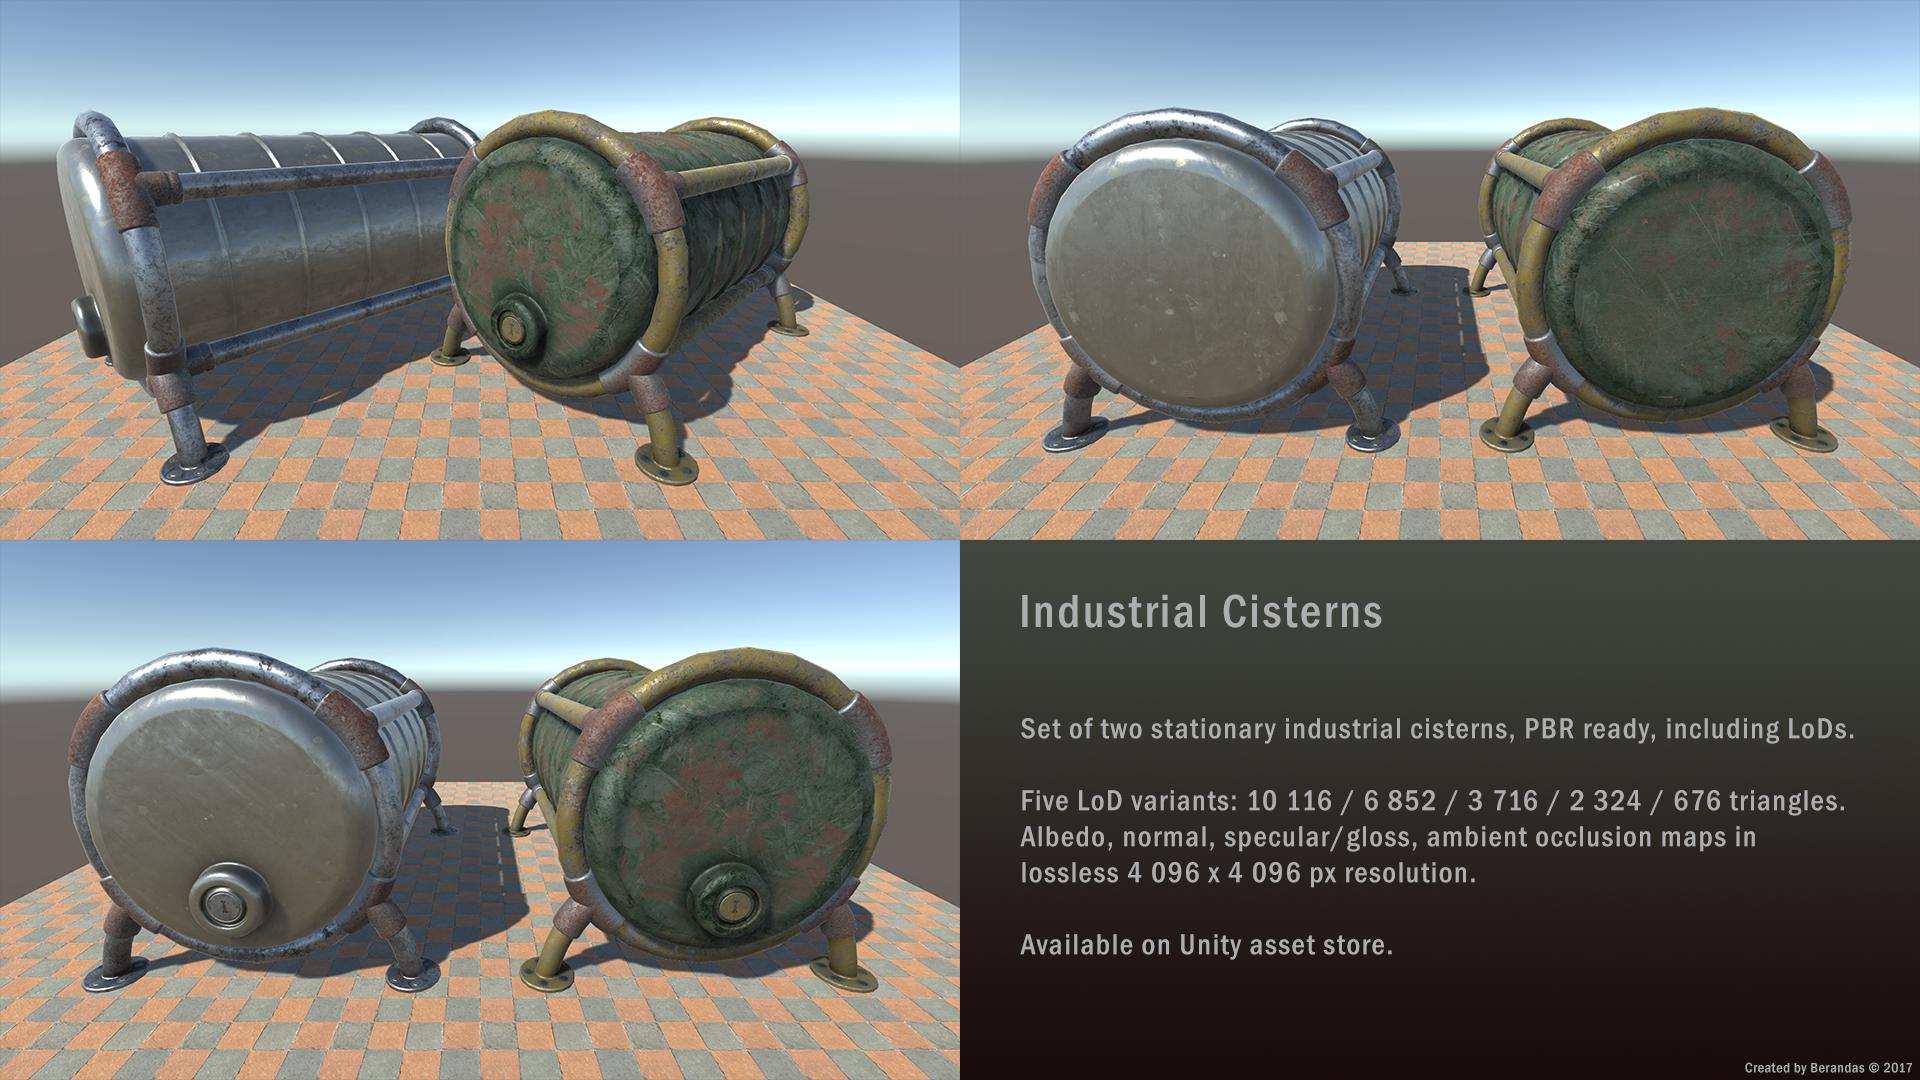 Industrial Cisterns by Berandas